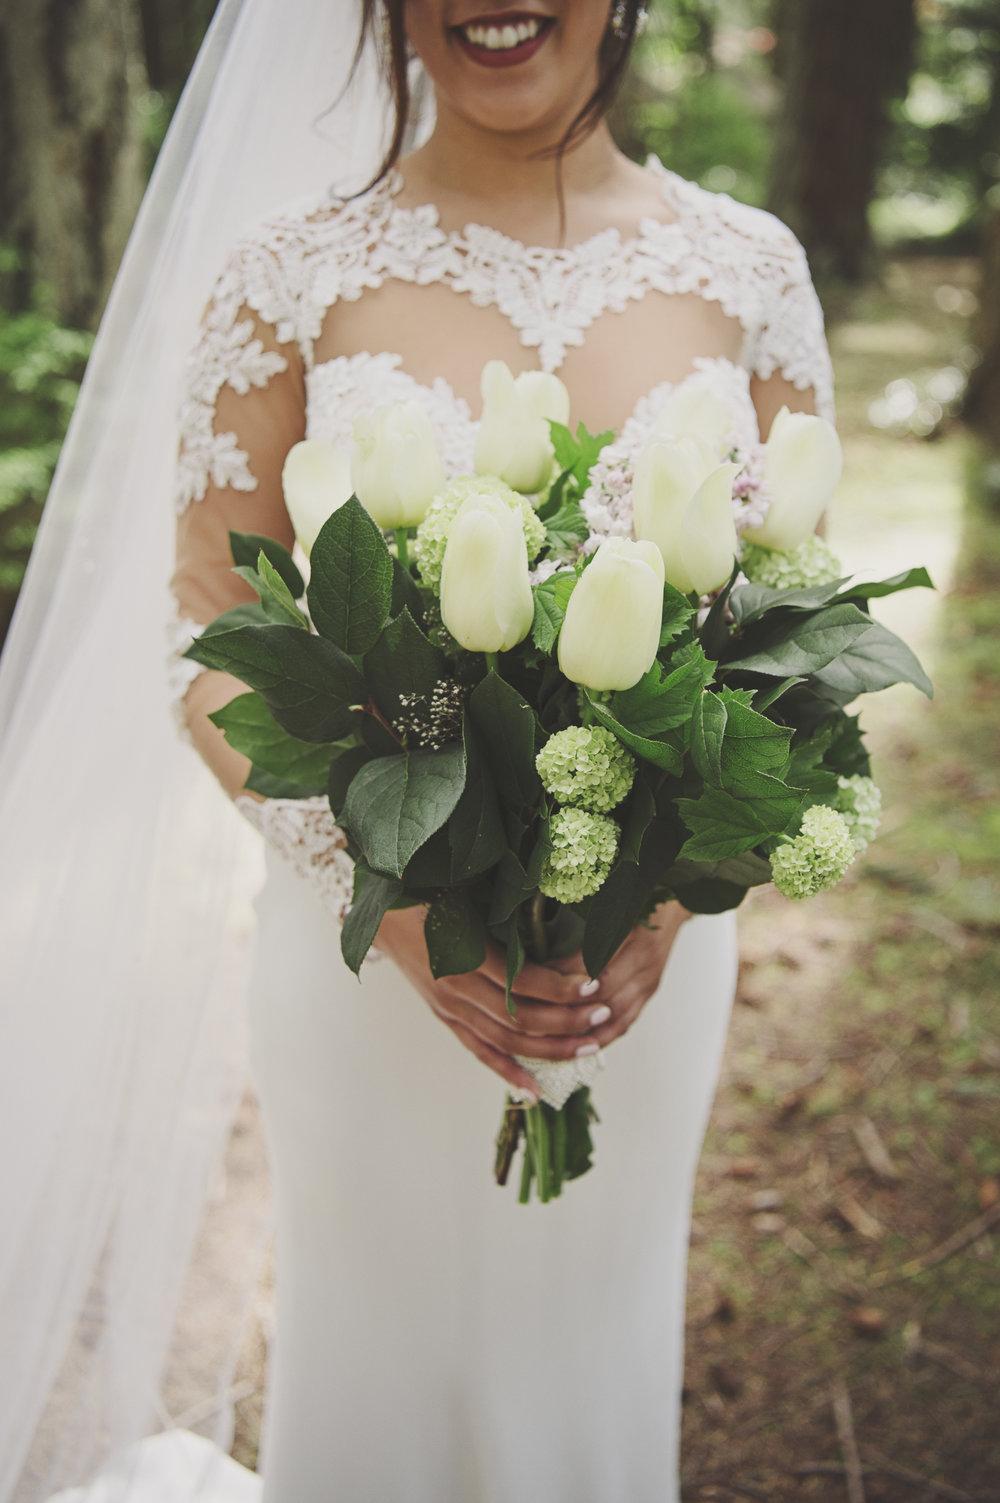 Pacific Northwest Wedding | Forest Wedding | Kitsap Memorial Park Wedding | Kelsey Lane Photography | Martina Liana Bridal | Sara Gabriel Veils